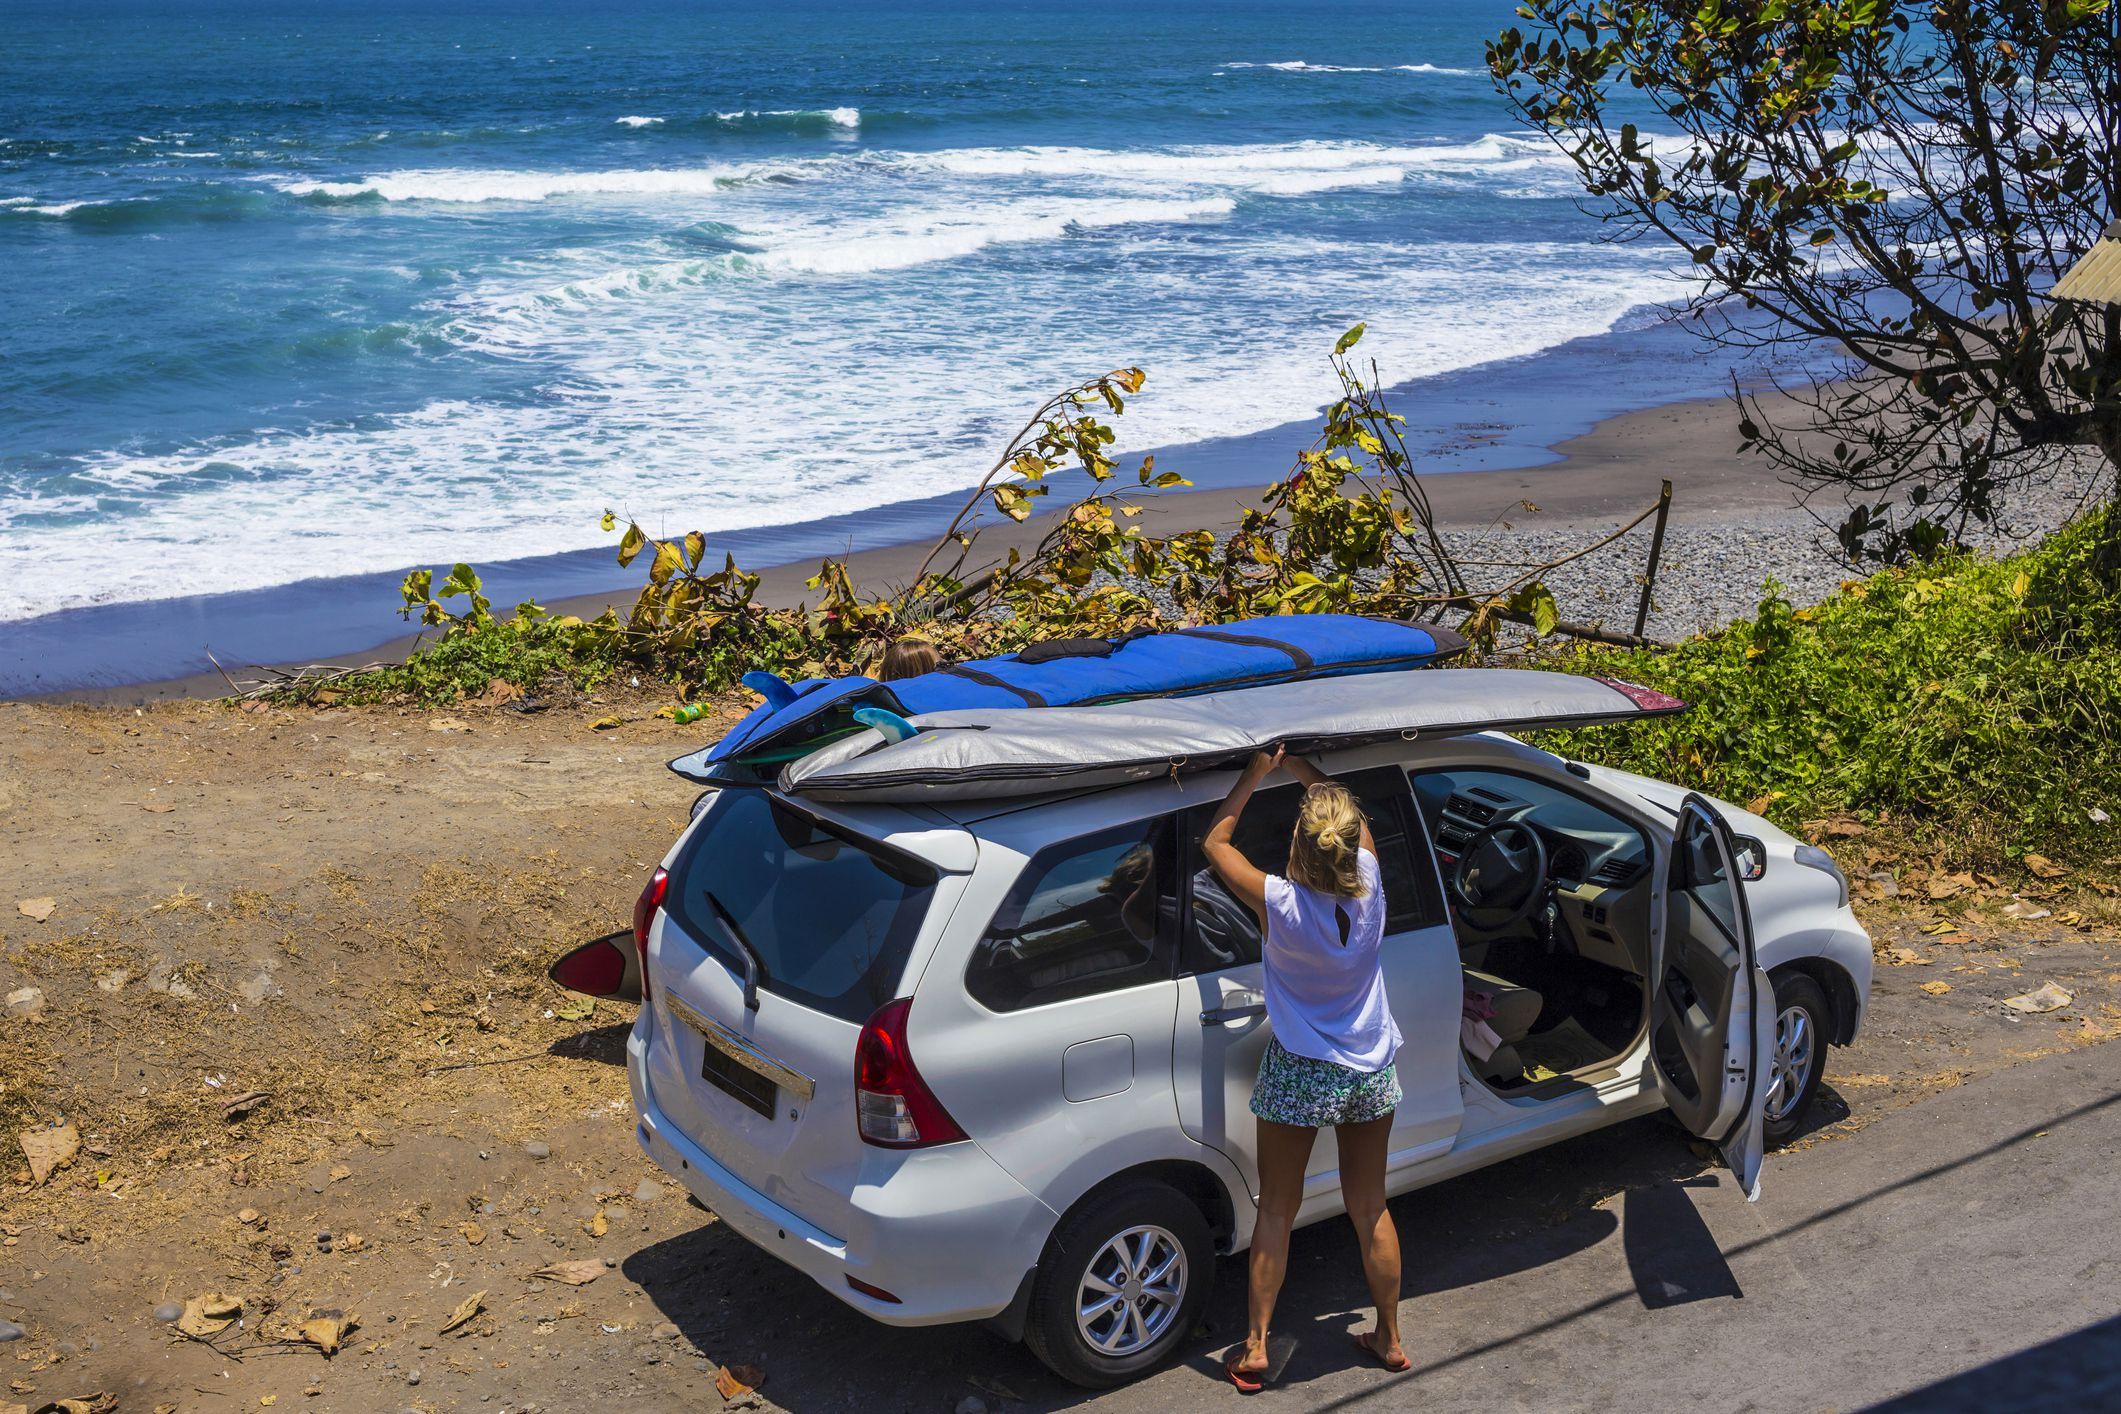 На Бали можно арендовать авто недорого